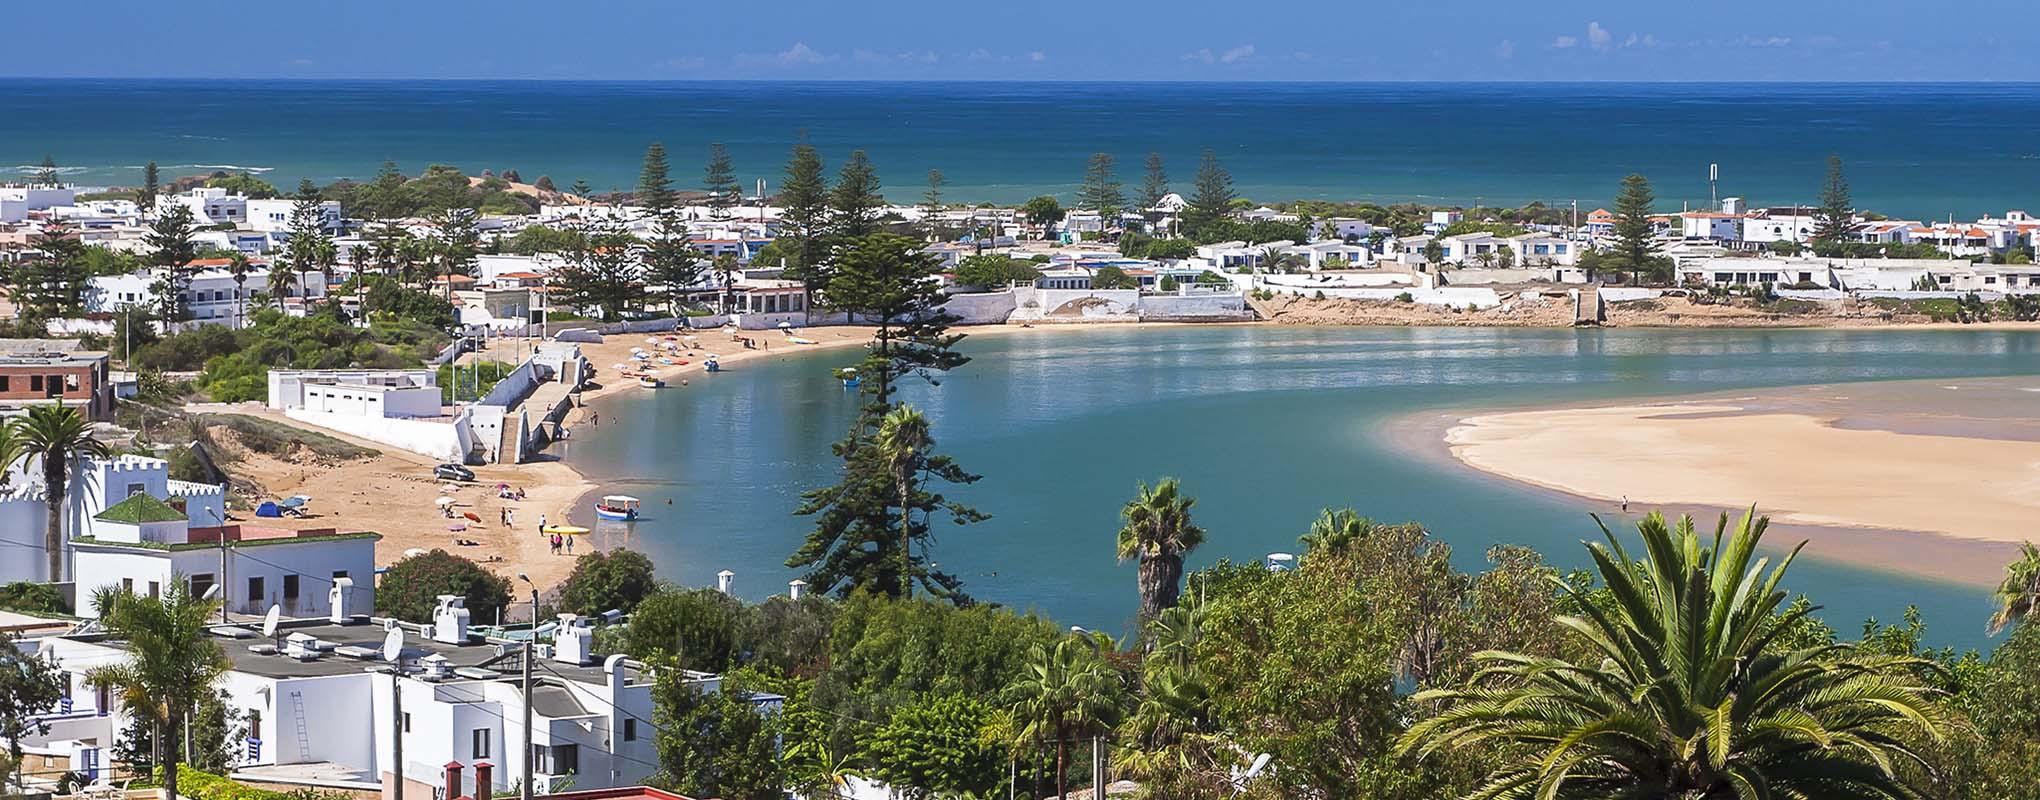 Oualidia costa atlantica de Marruecos